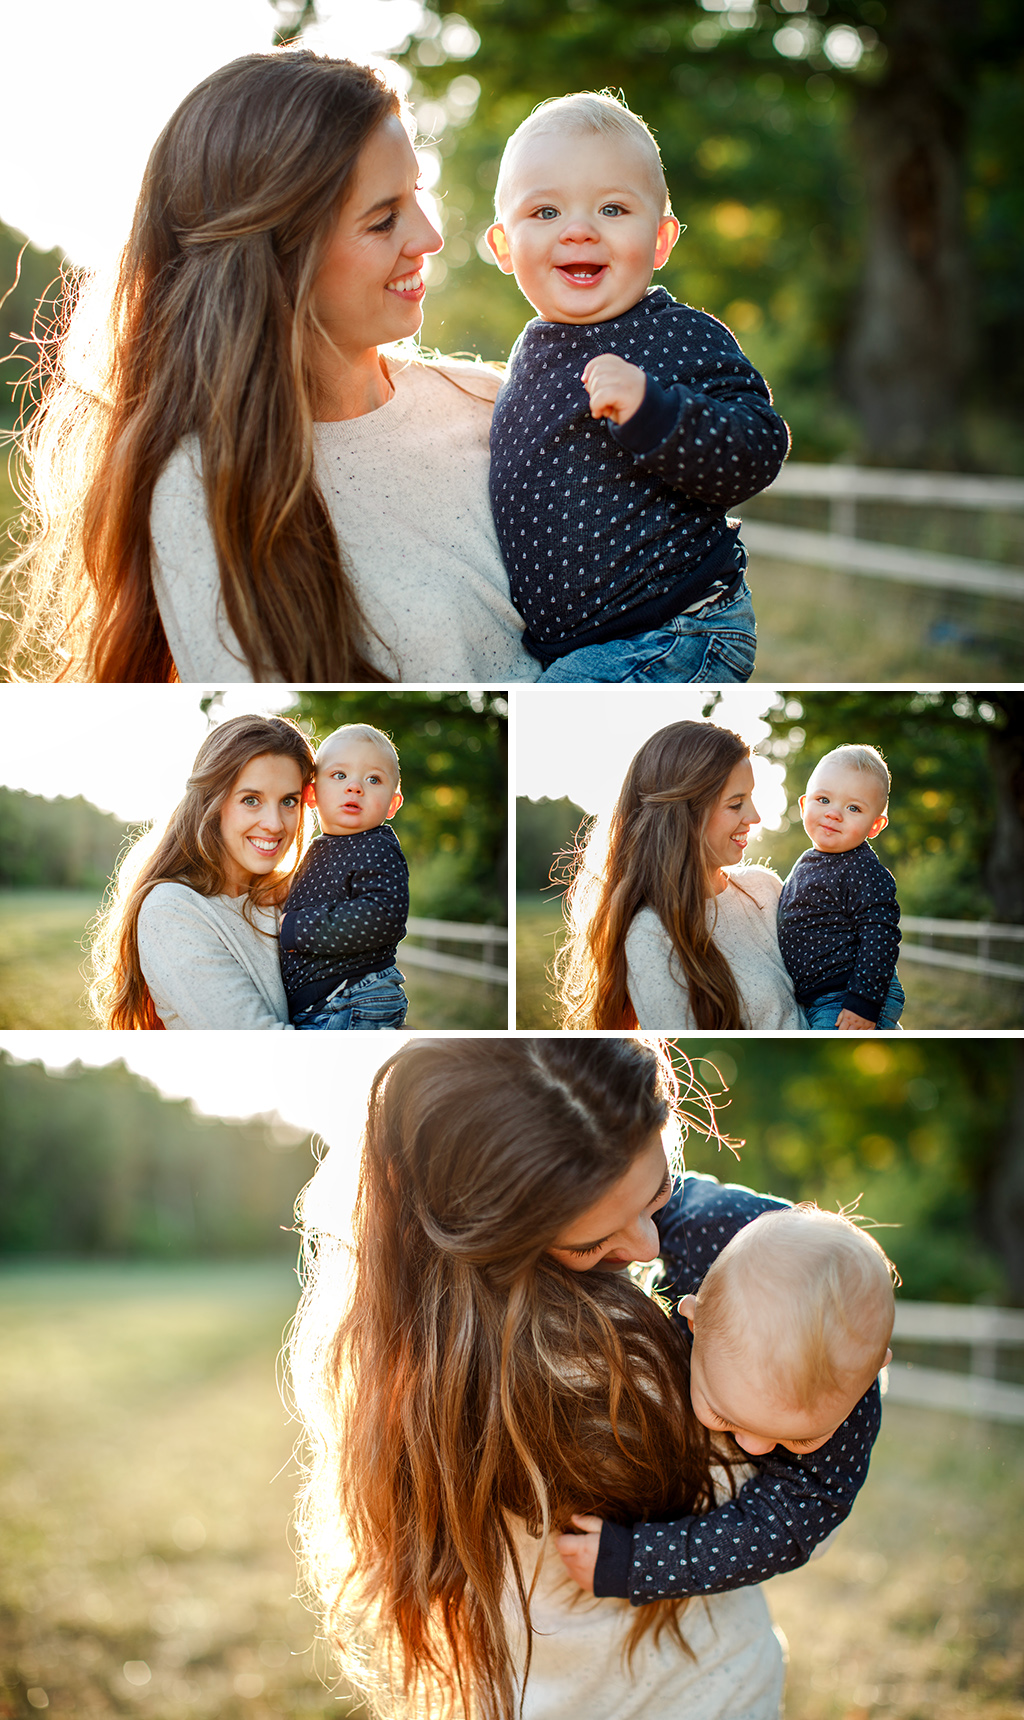 Familjefotografering_Stockholm_Familjefotograf-Anna-Sandstrom_12.jpg